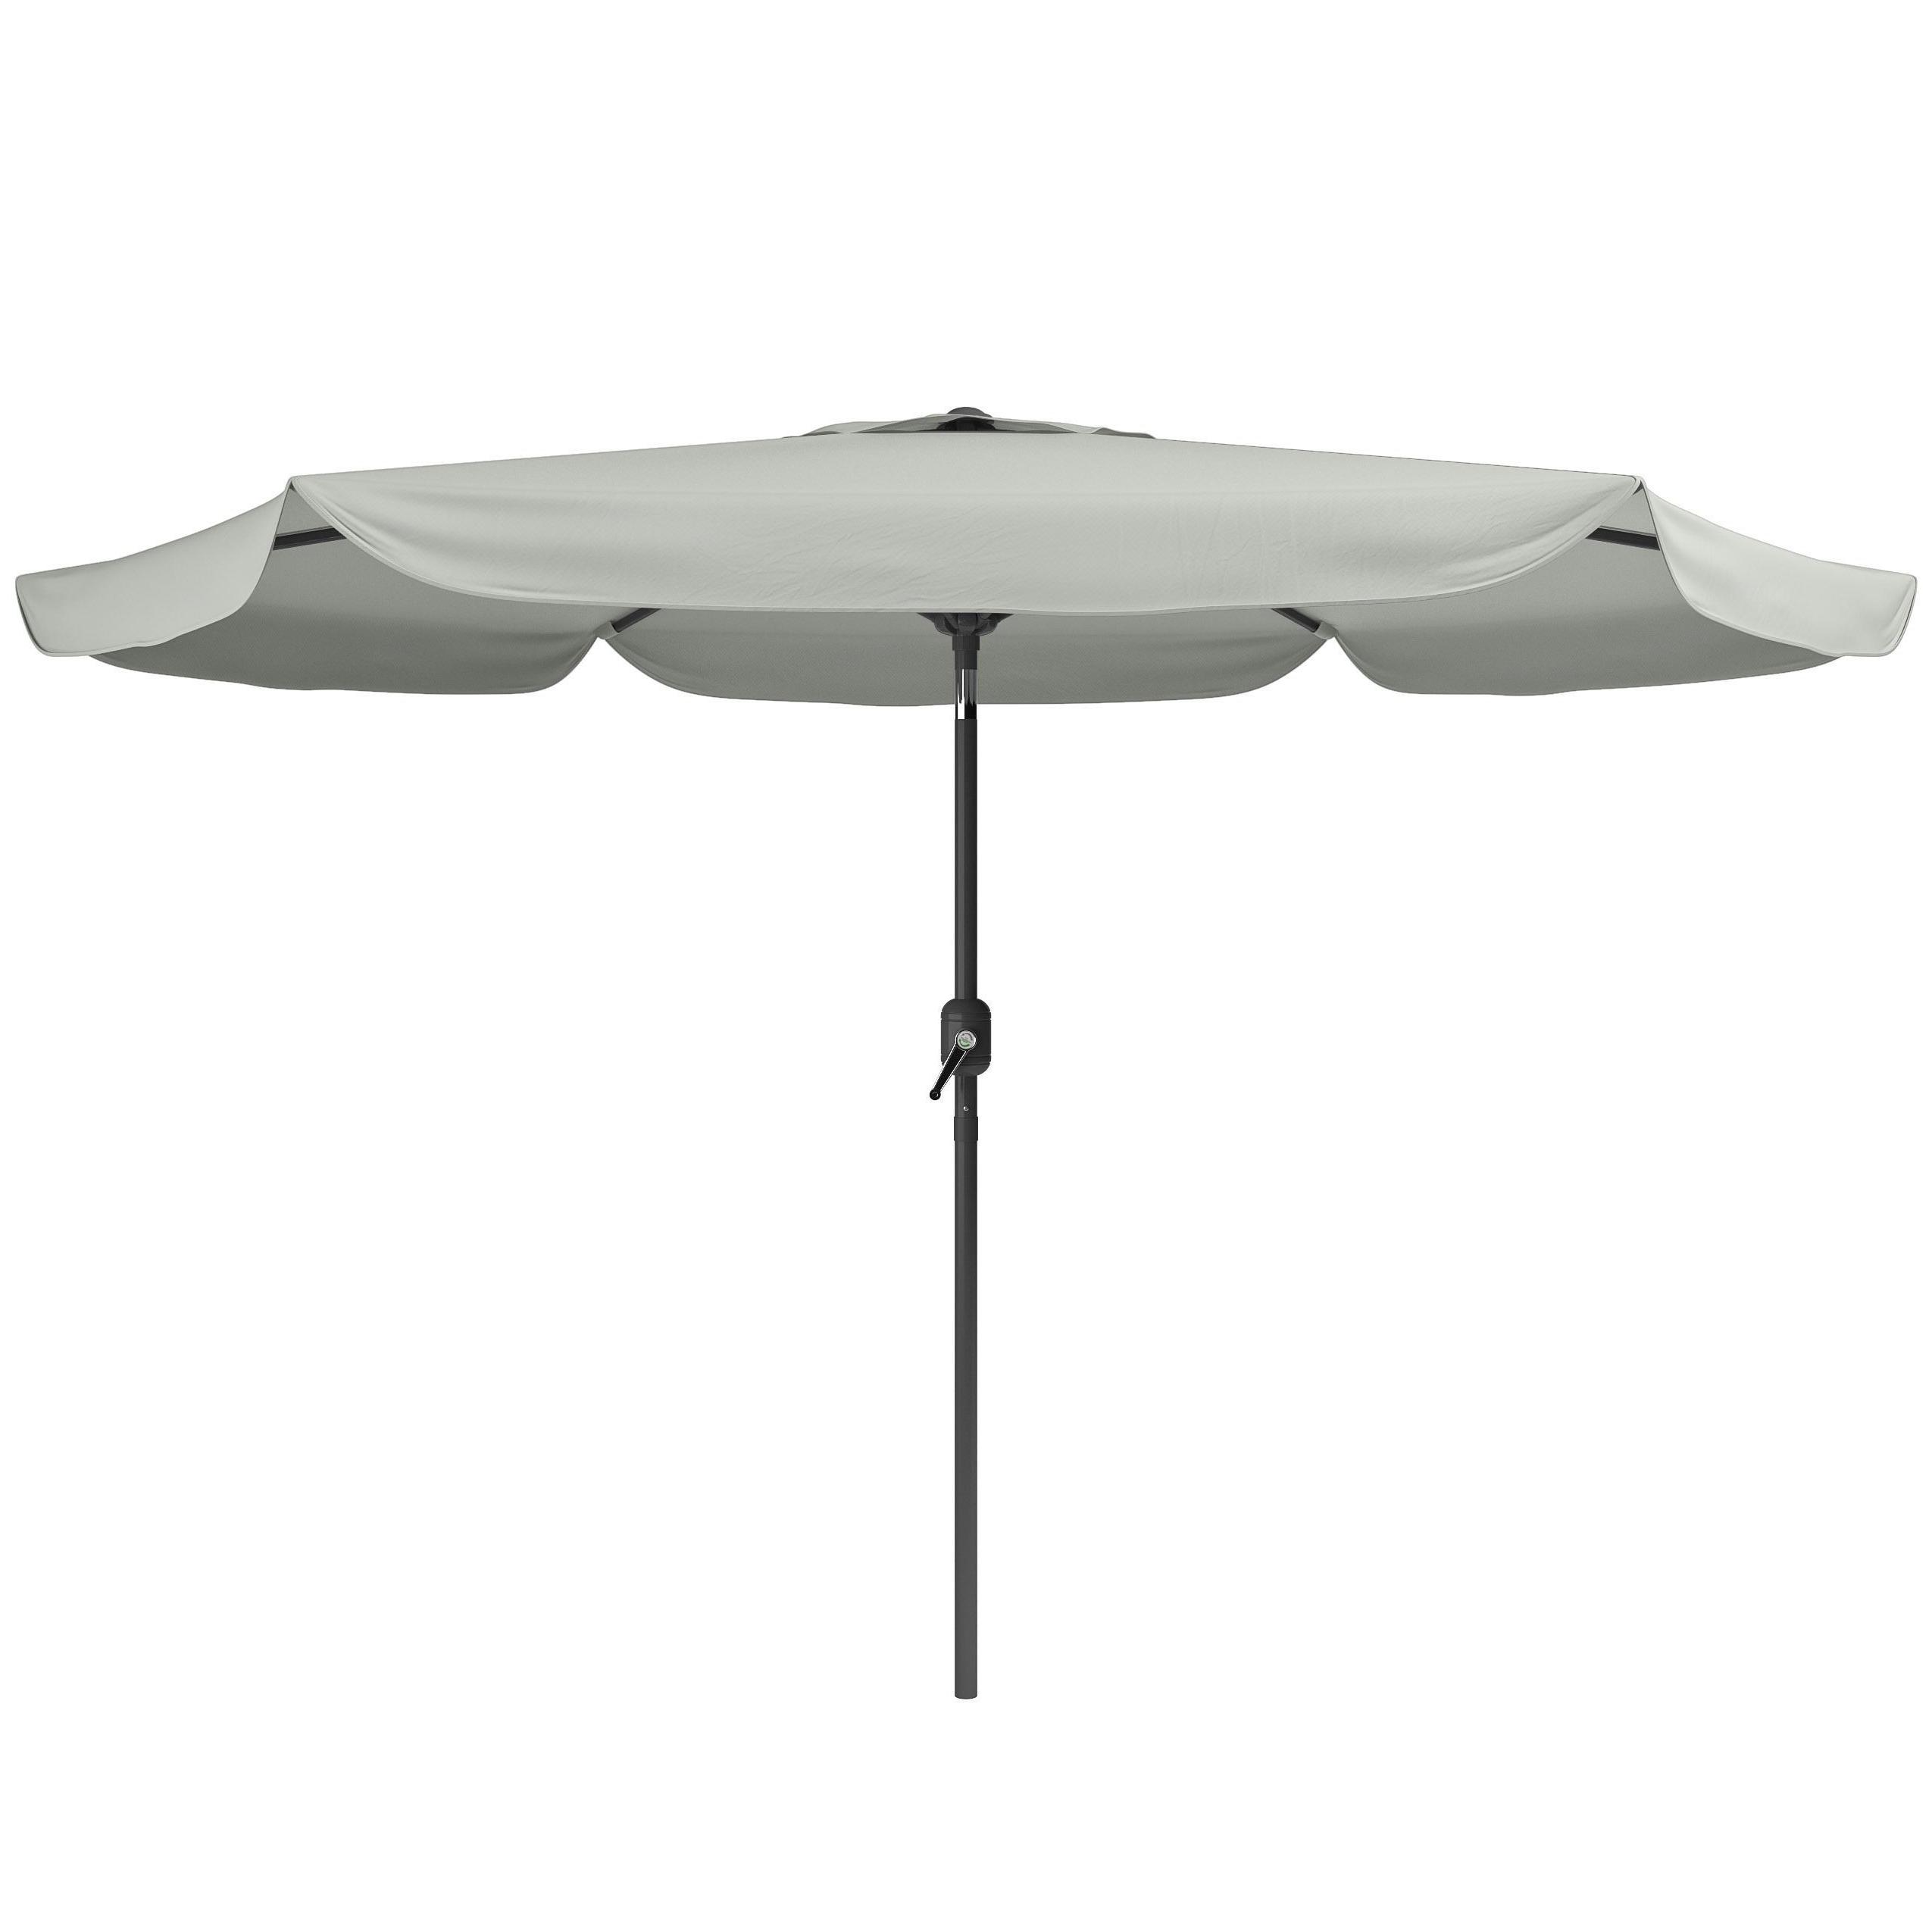 Corliving Tilting Patio Umbrella (Sand Grey), Size  (View 2 of 20)